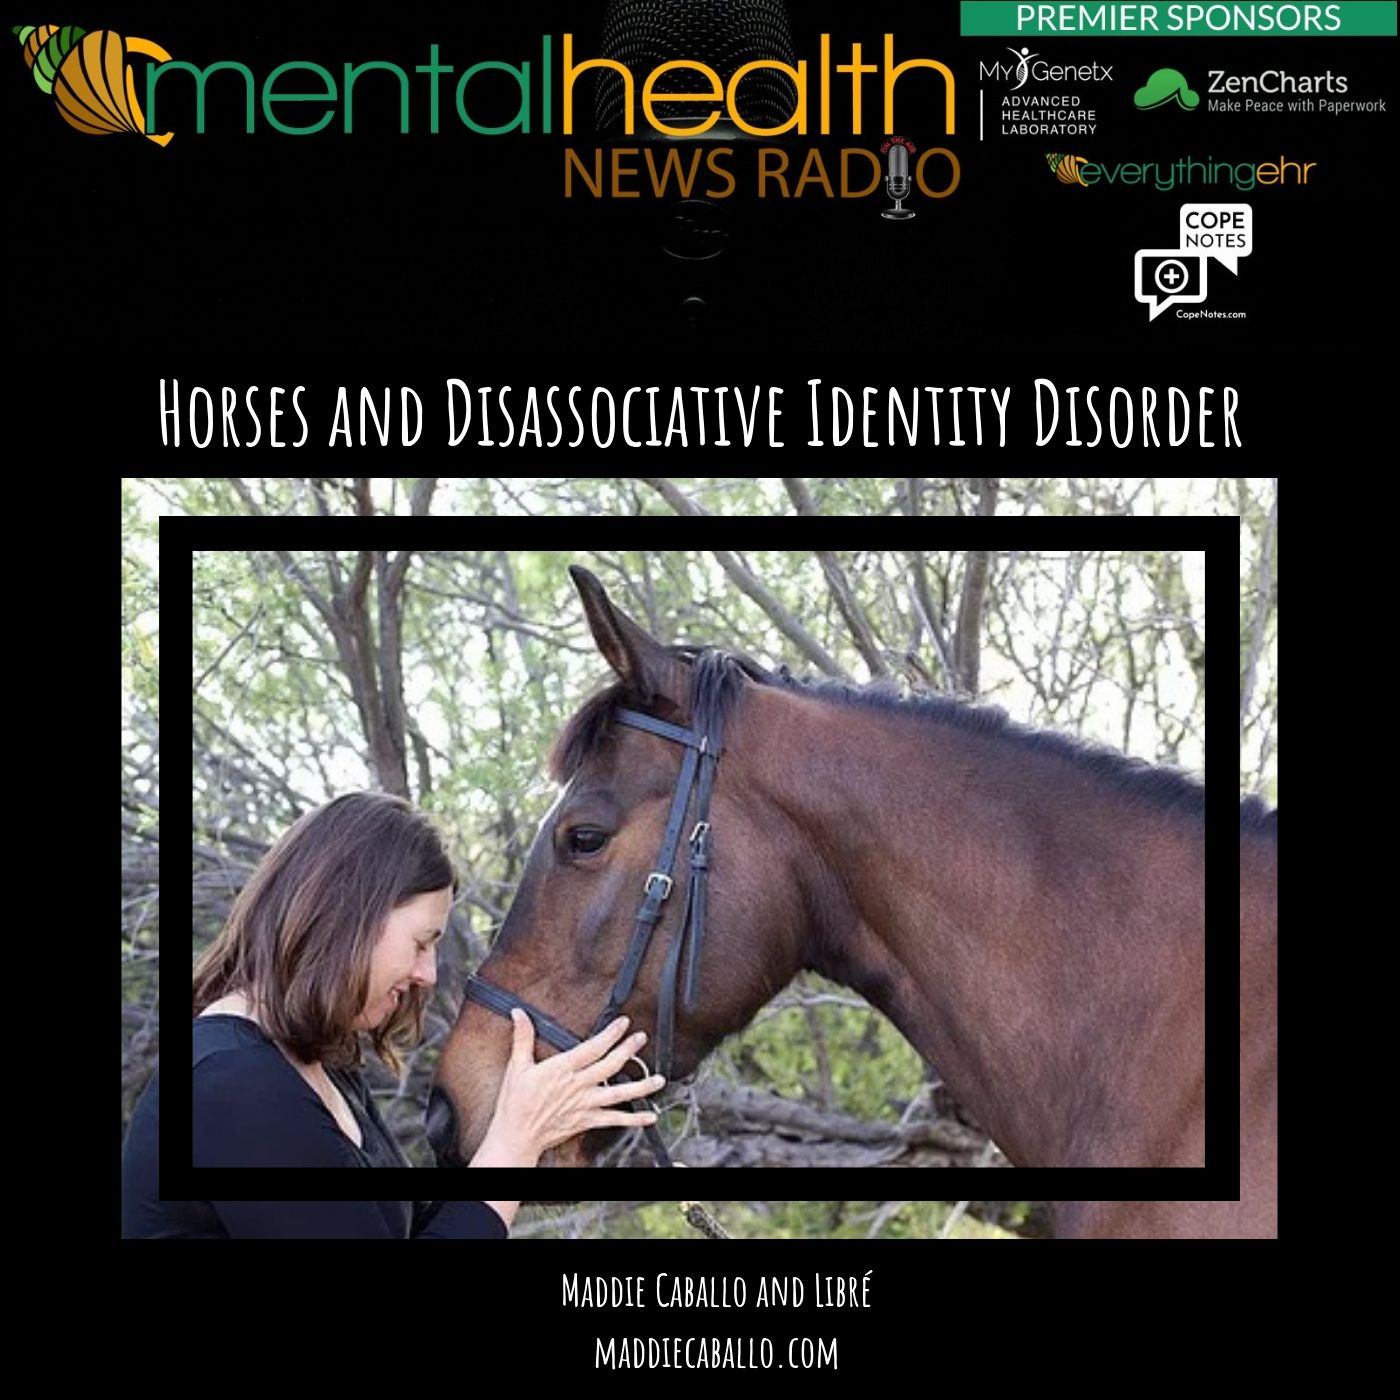 Mental Health News Radio - Horses and Dissociative Identity Disorder: Maddie Caballo